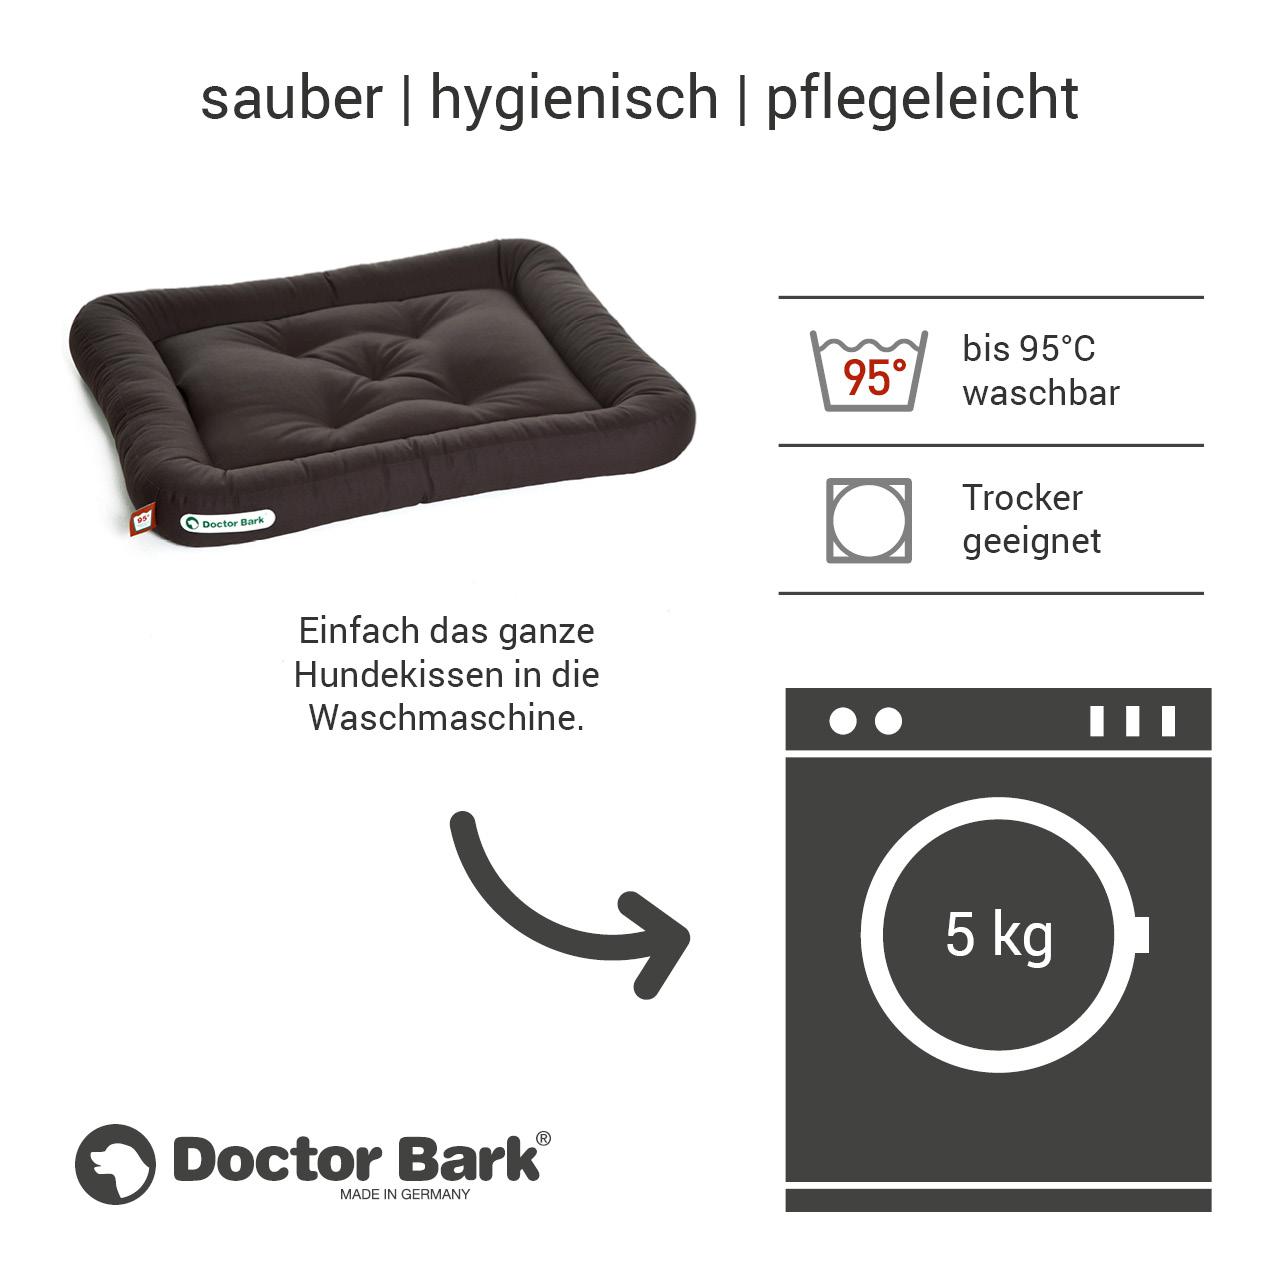 Lounge-Hundekissen / Hundebett orthopädisch Doctor Bark waschbar braun - Gr. M